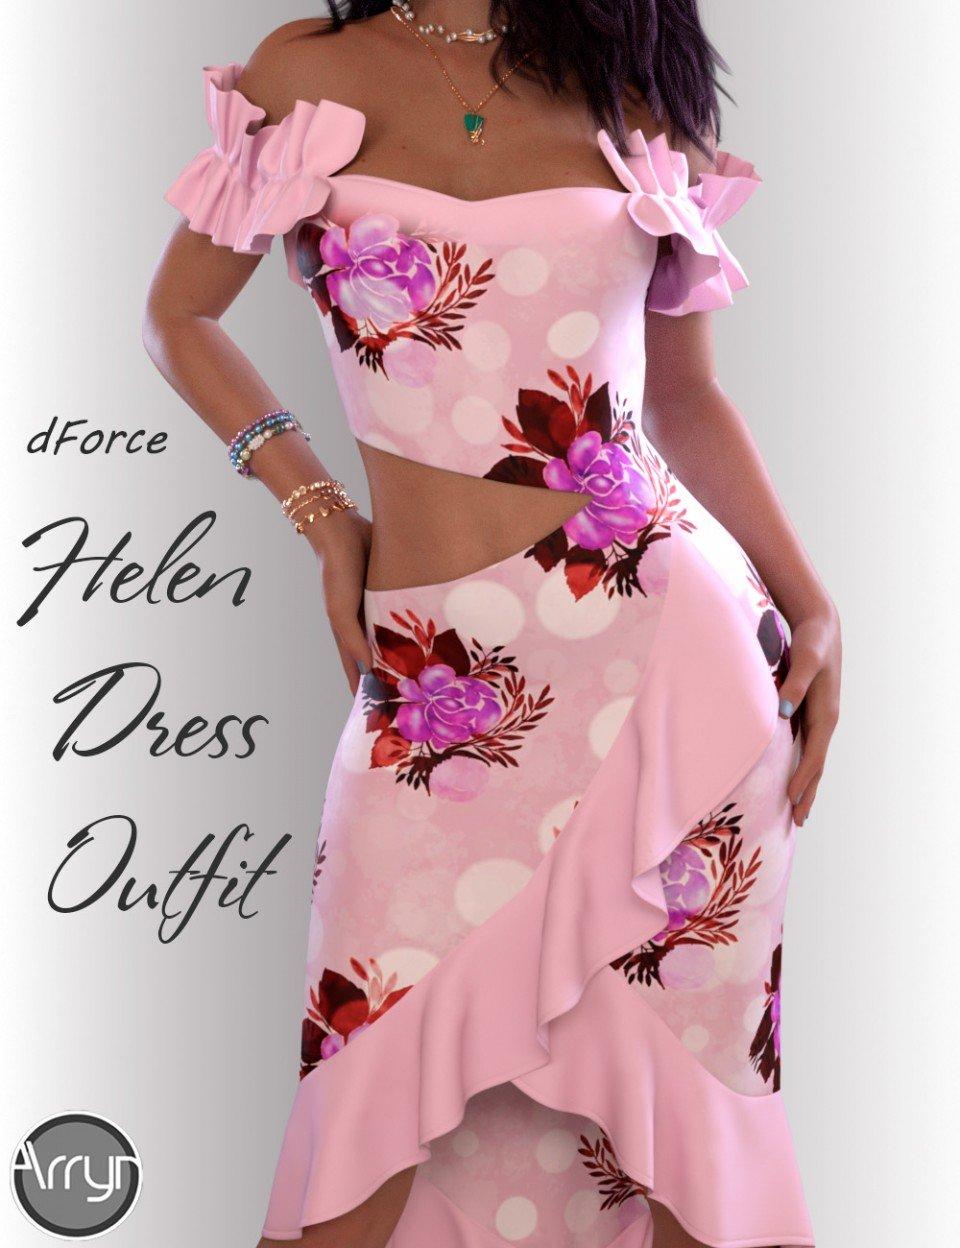 dForce Helen Cocktail Dress Outfit for Genesis 8 Female(s)_DAZ3D下载站